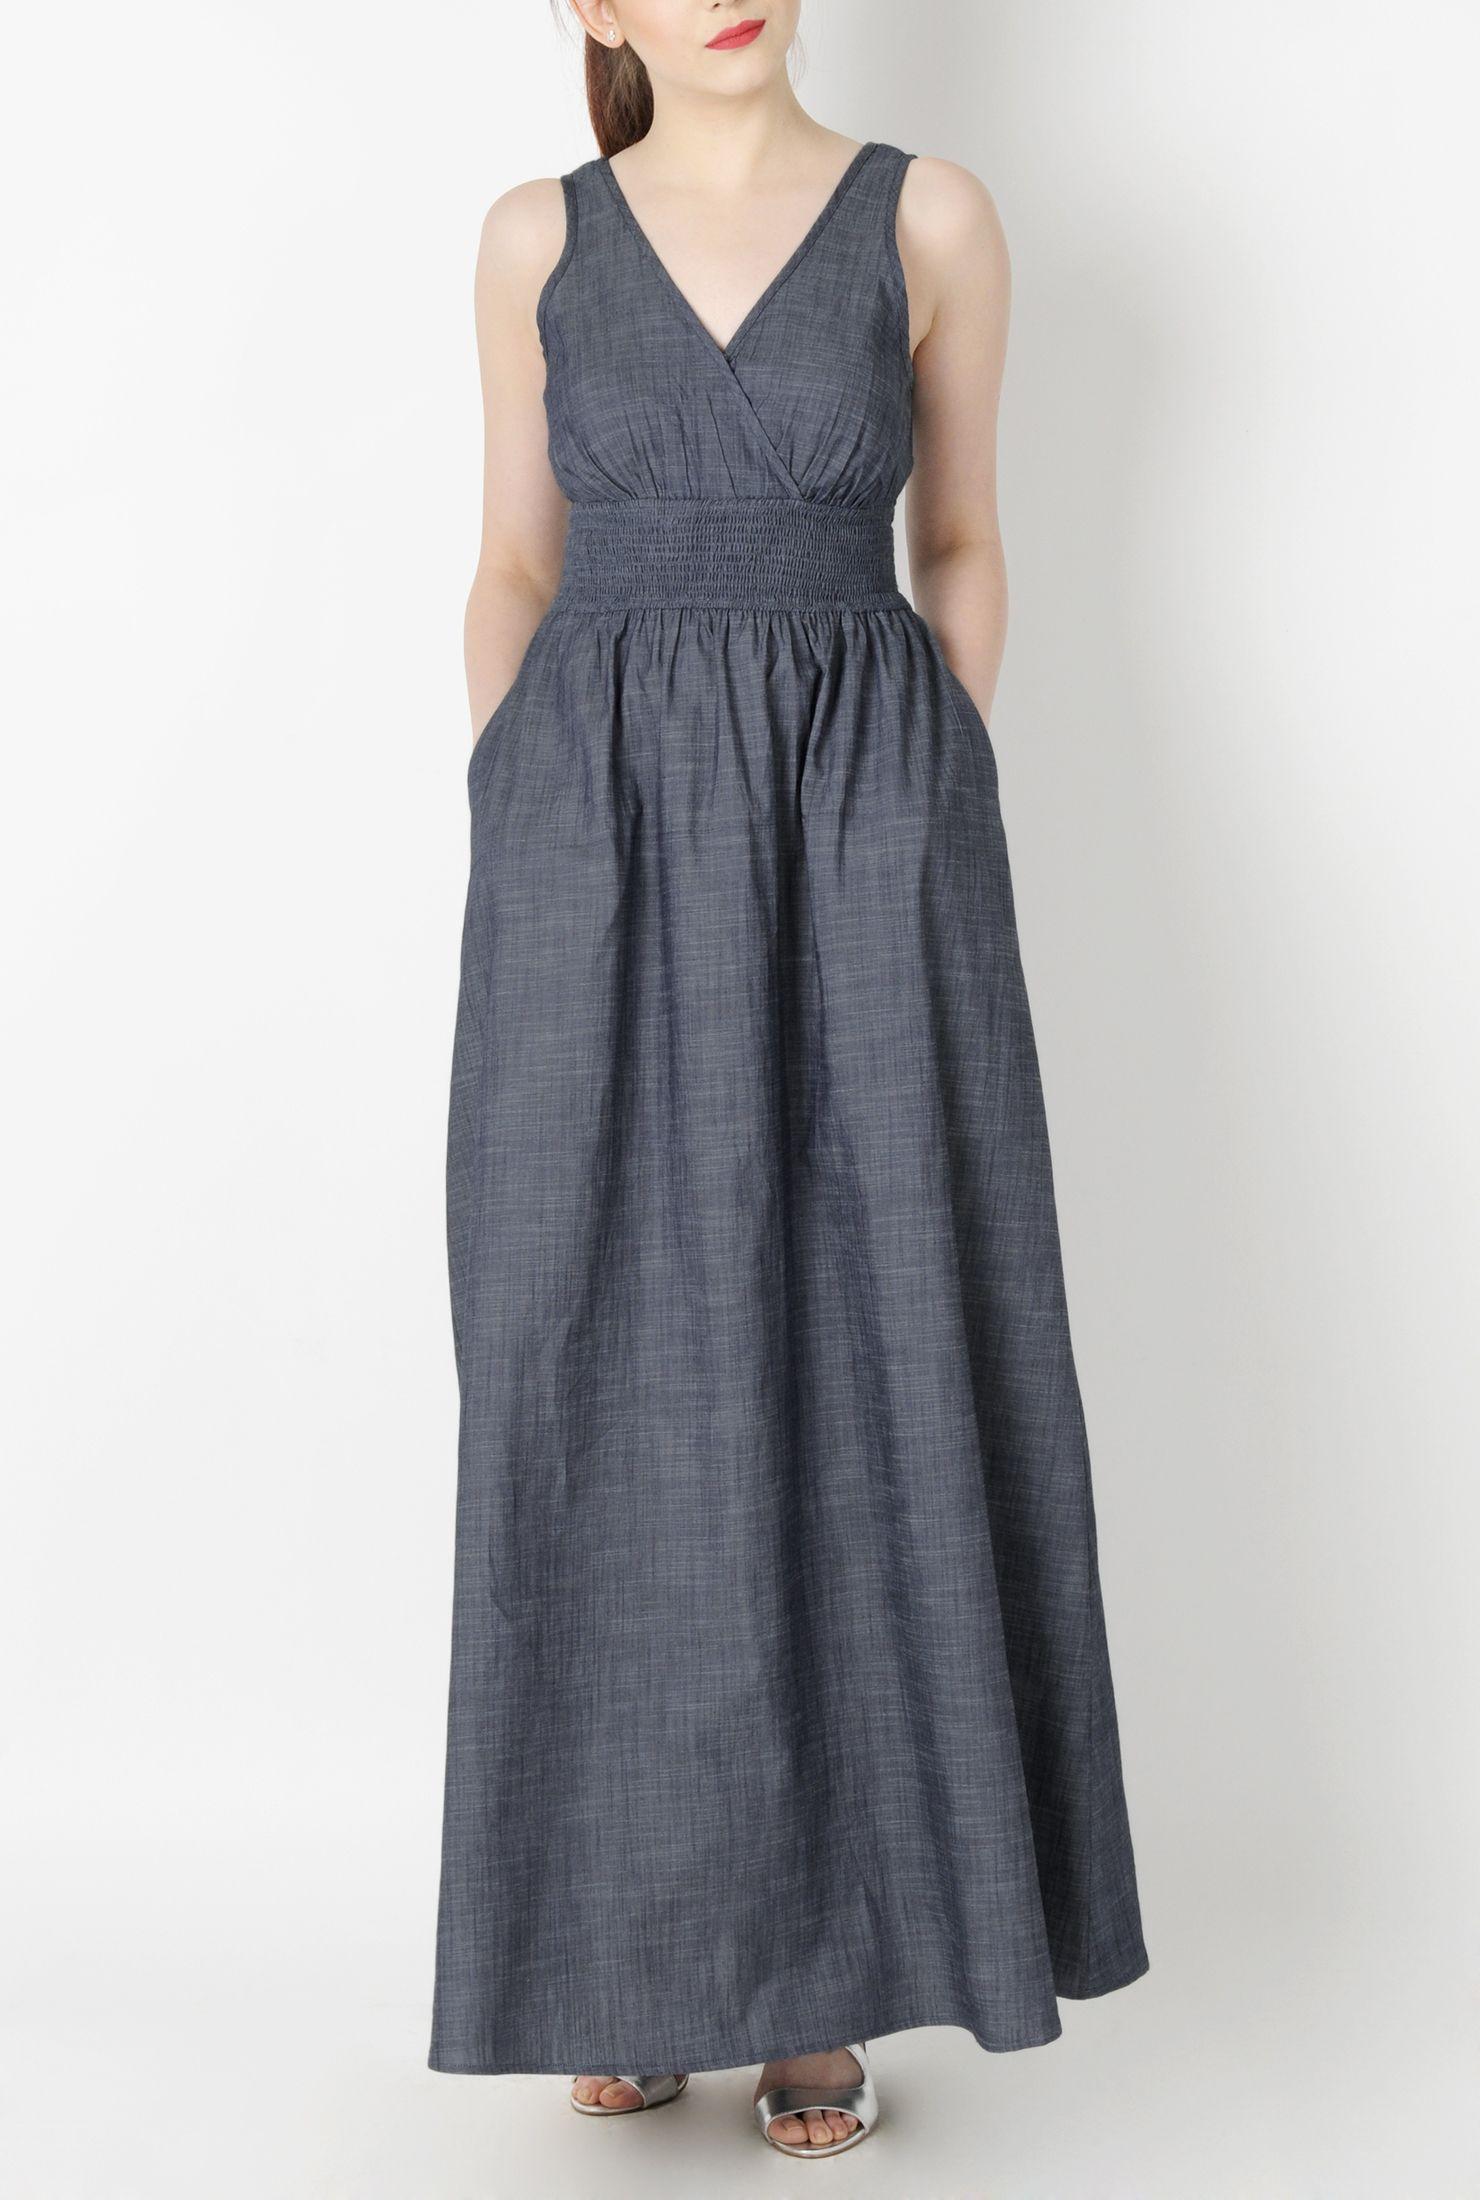 Chambray Maxi Dress, Plus Size Maxi Dresses Shop women\'s ...